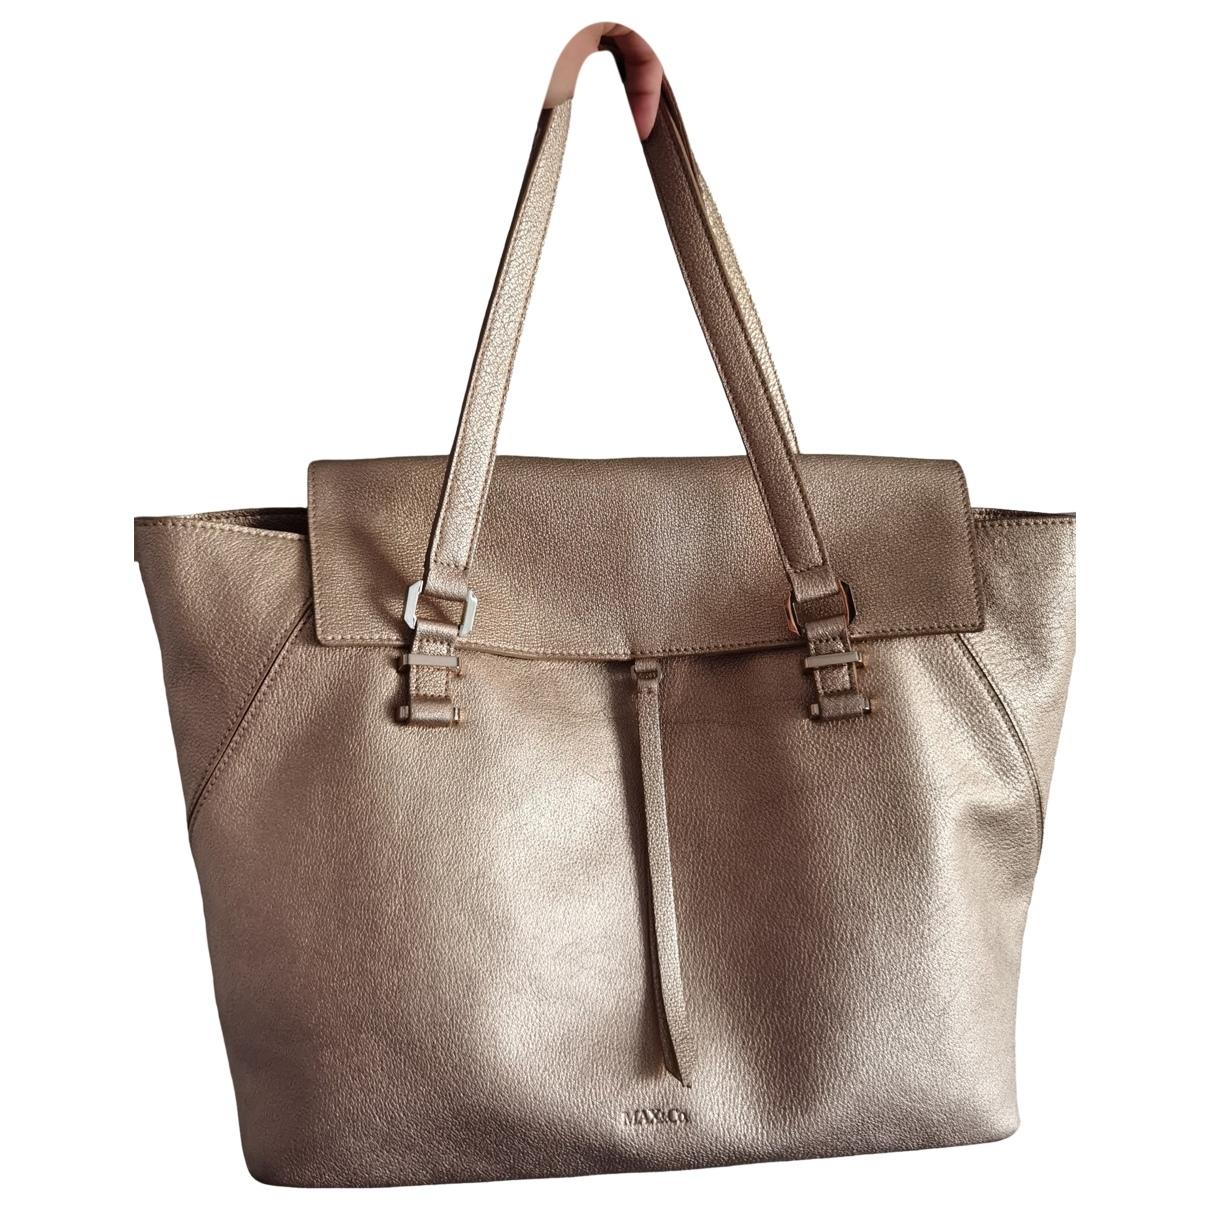 Max & Co \N Gold Leather handbag for Women \N